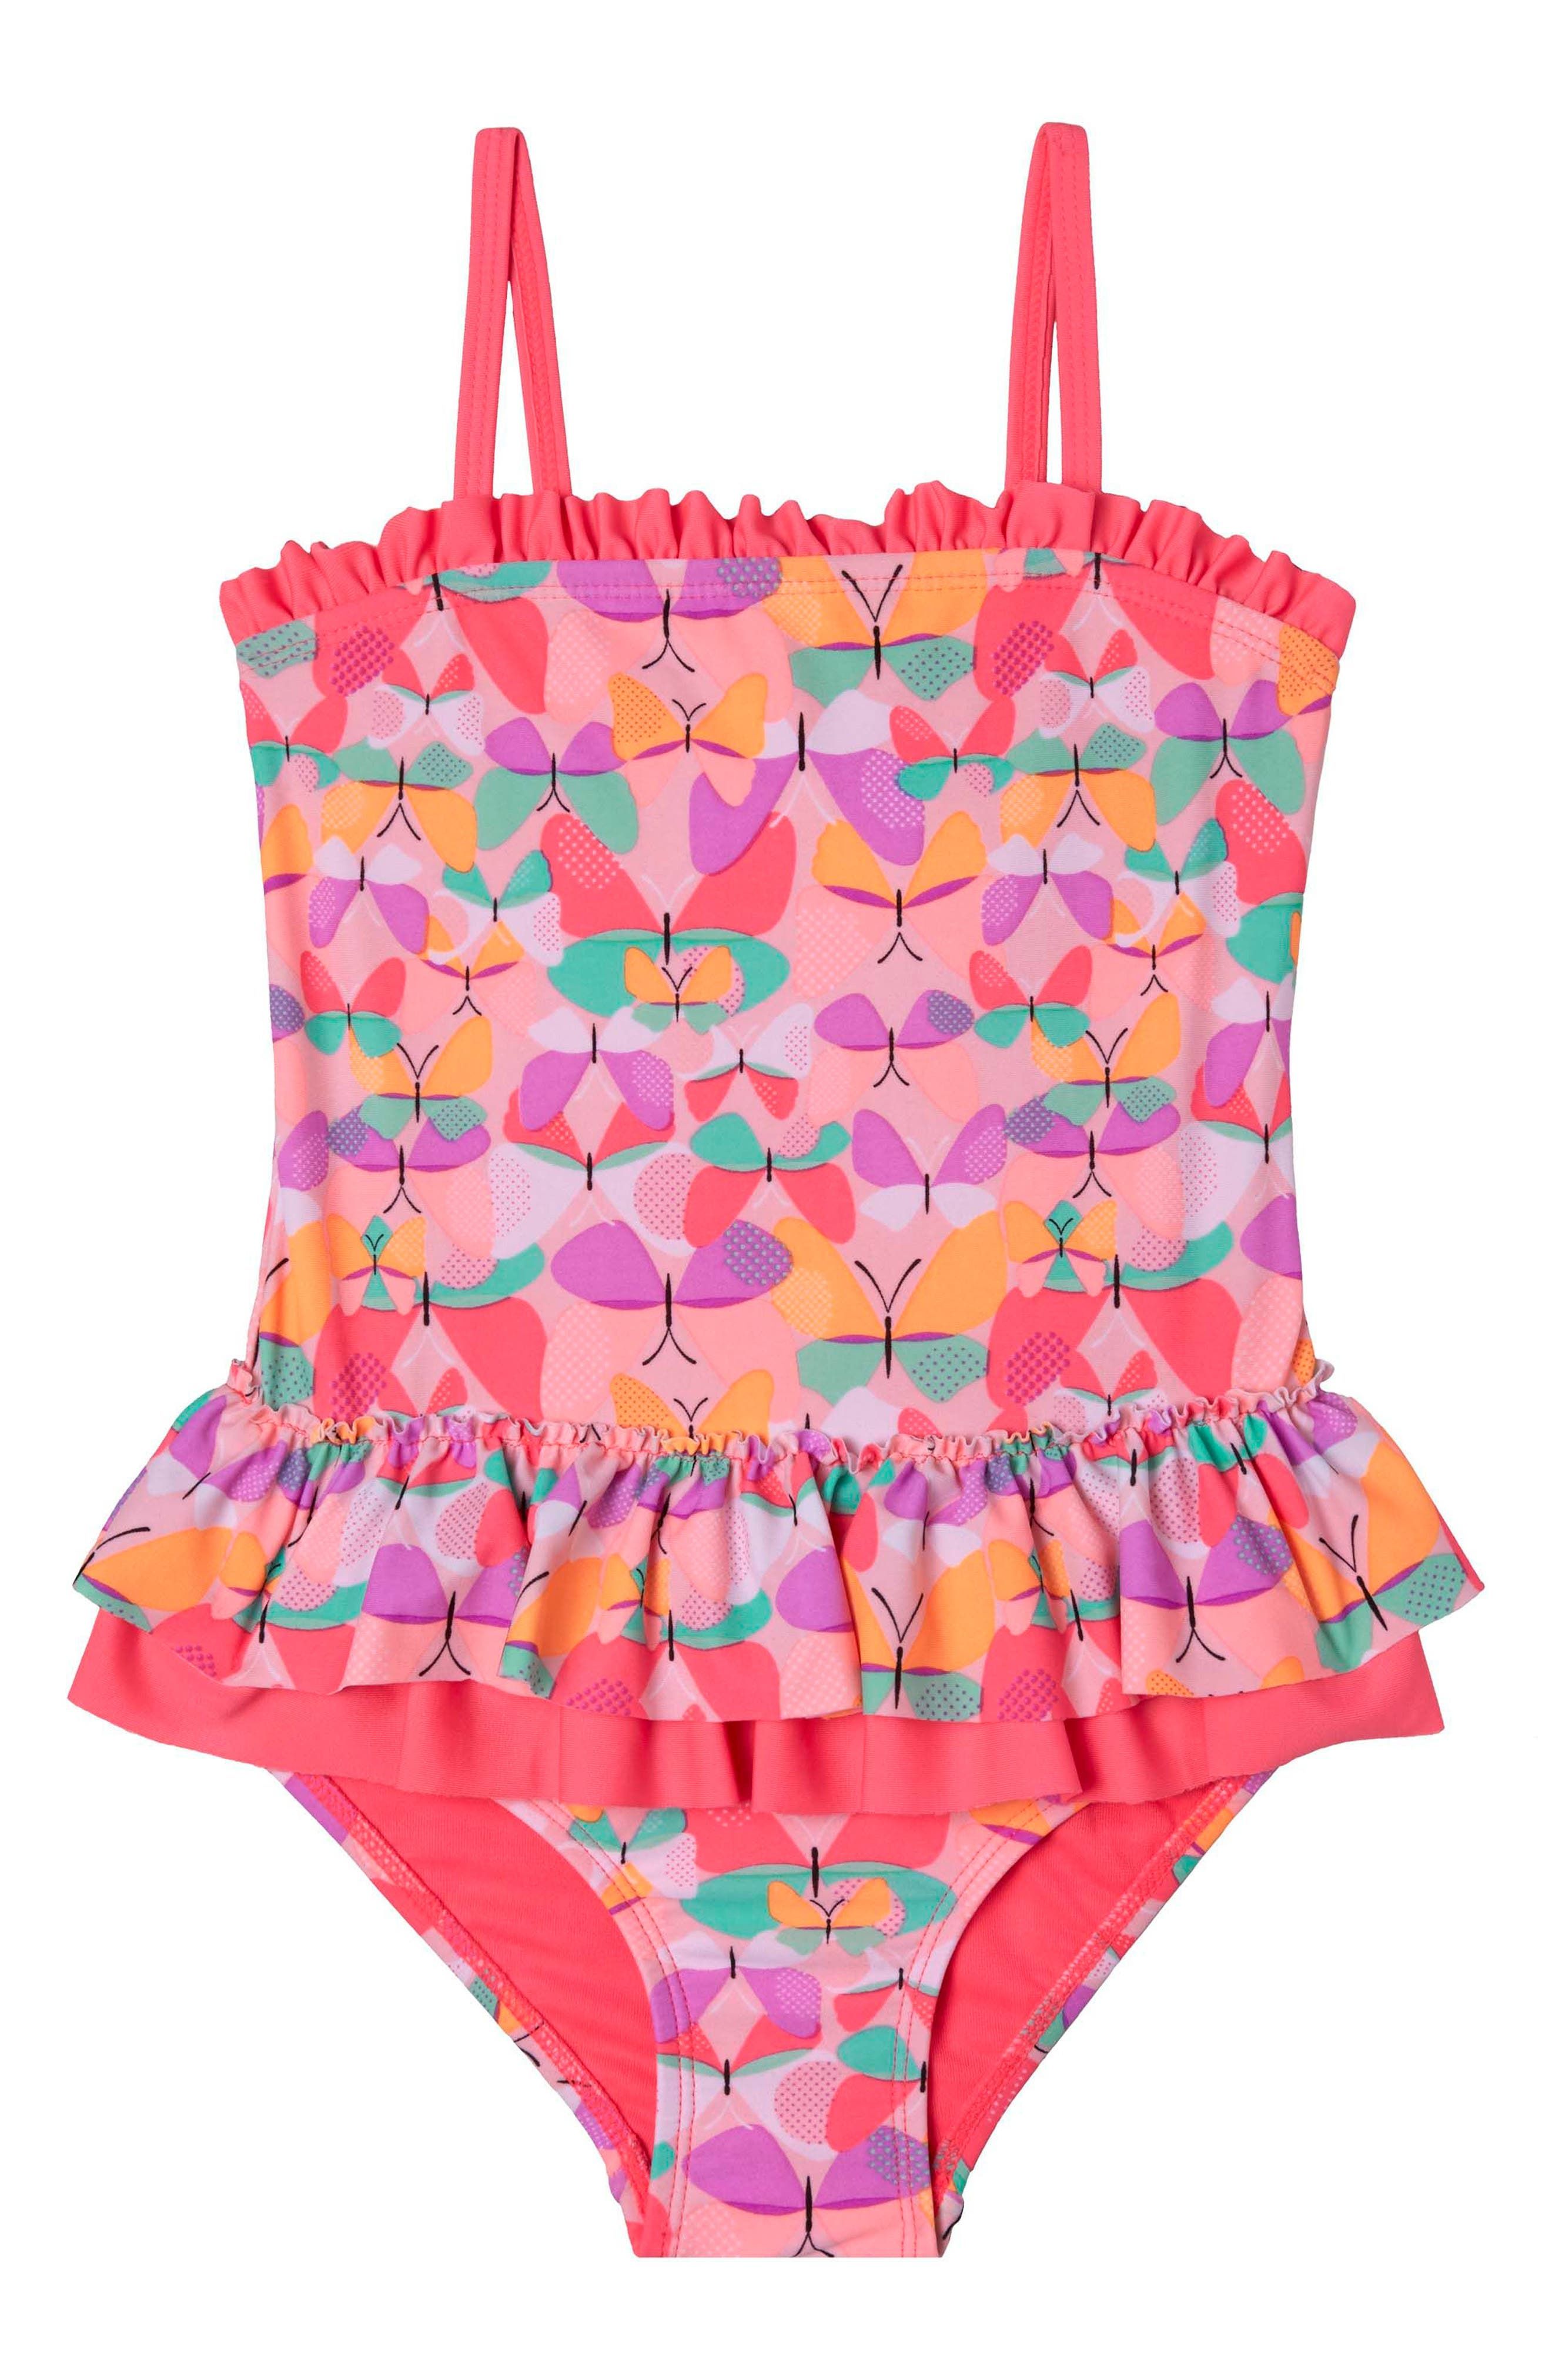 Main Image - Hula Star Butterfly Cutie One-Piece Swimsuit (Toddler Girls & Little Girls)